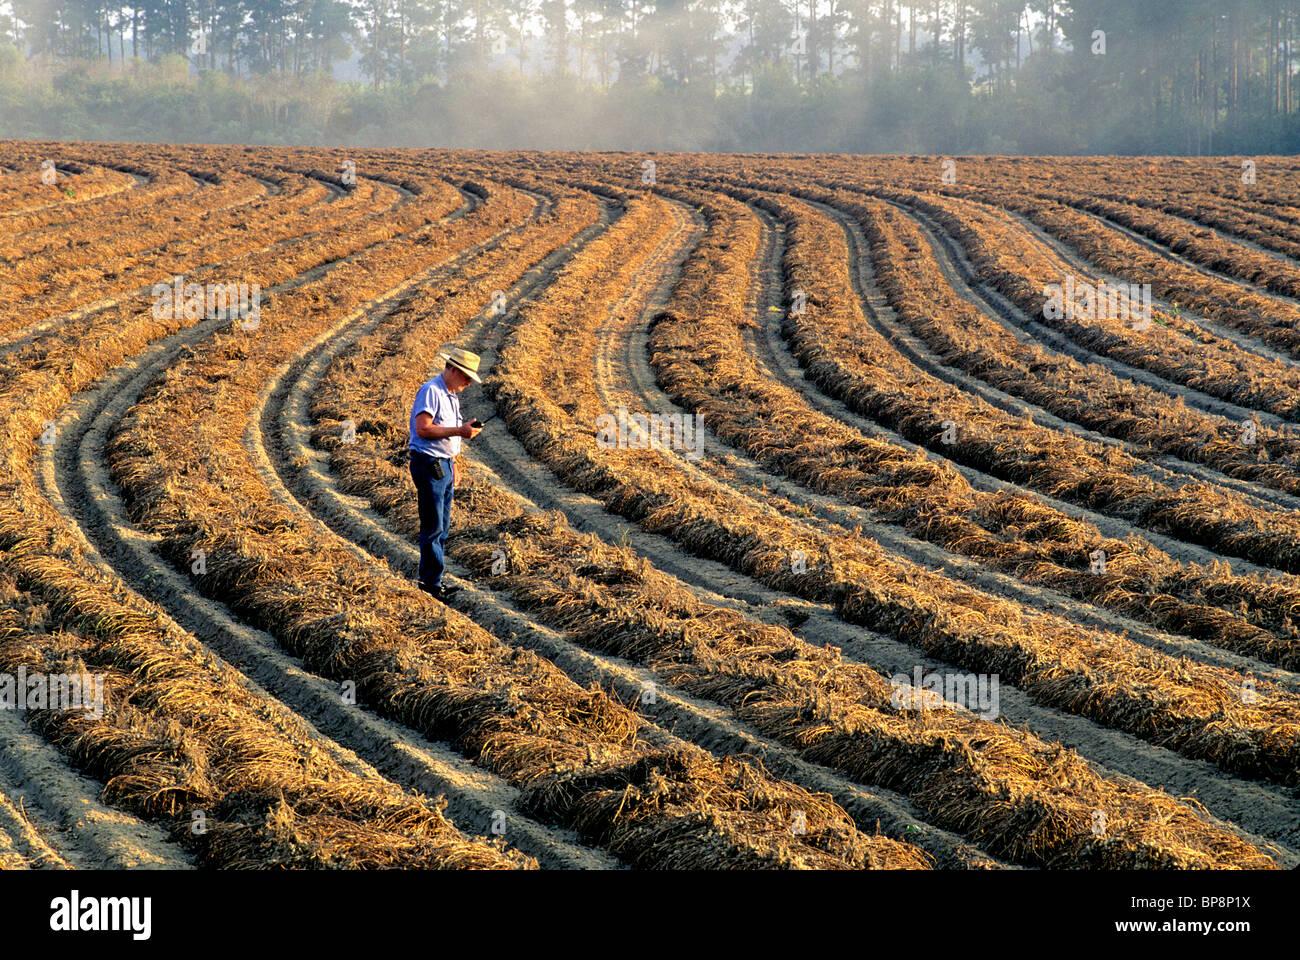 Peanut harvest, inverted contoured rows. - Stock Image